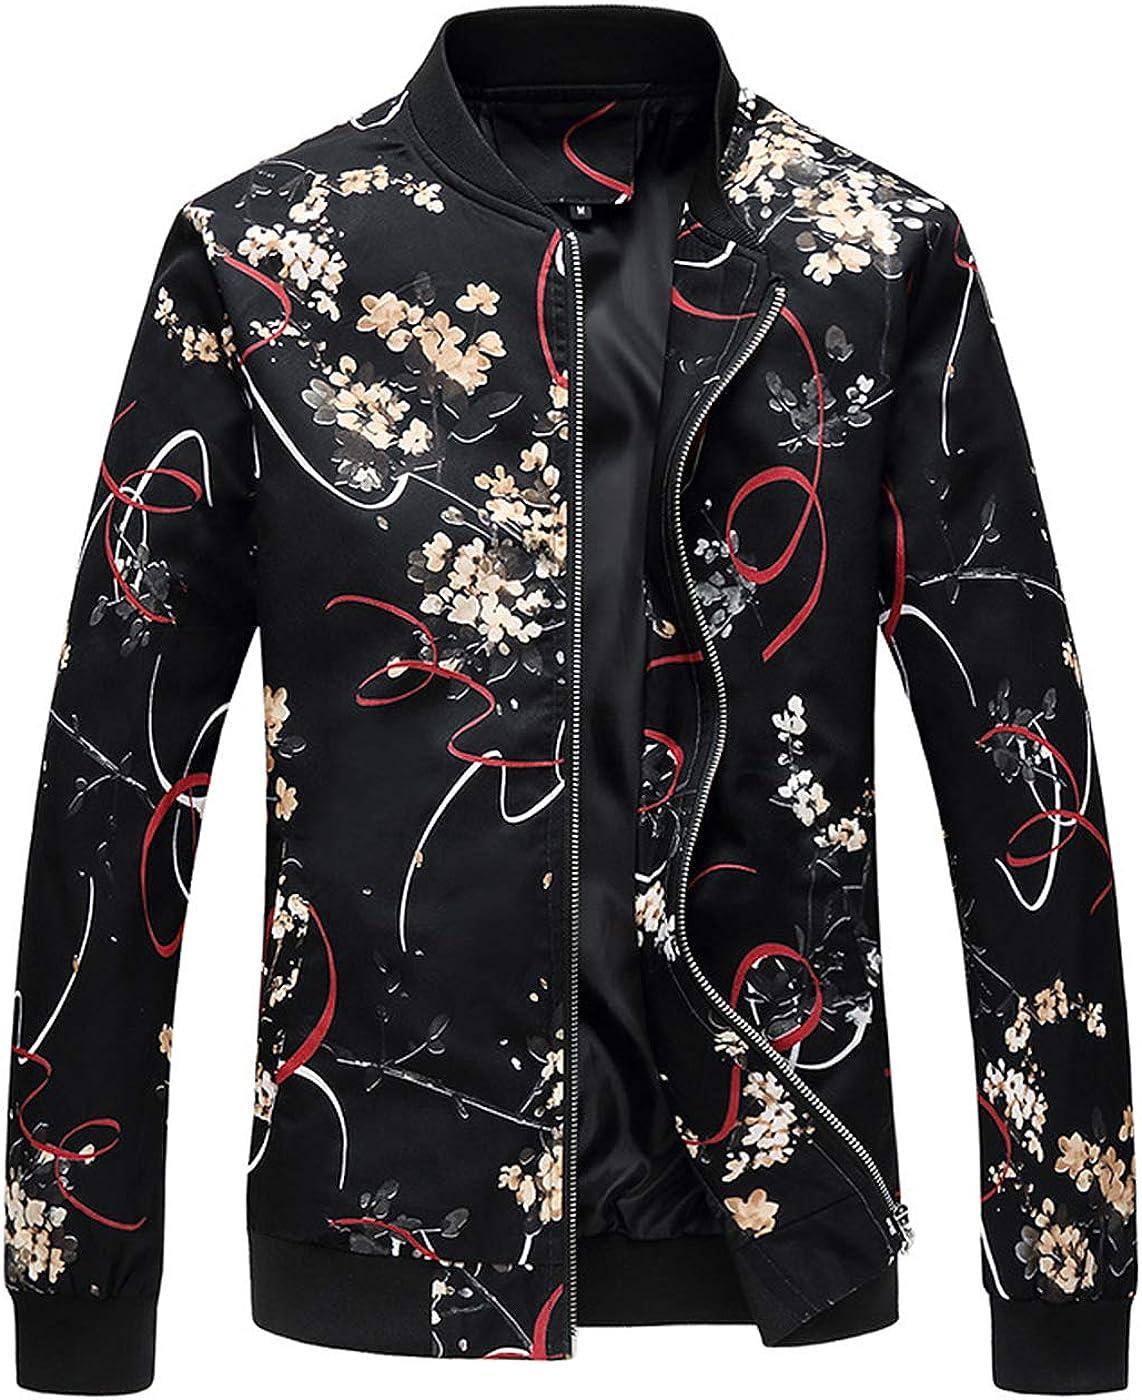 NXSTB Men's Bomber Tucson Mall Jacket Casual Slim Philadelphia Mall Printed Coat Outerwear Fit